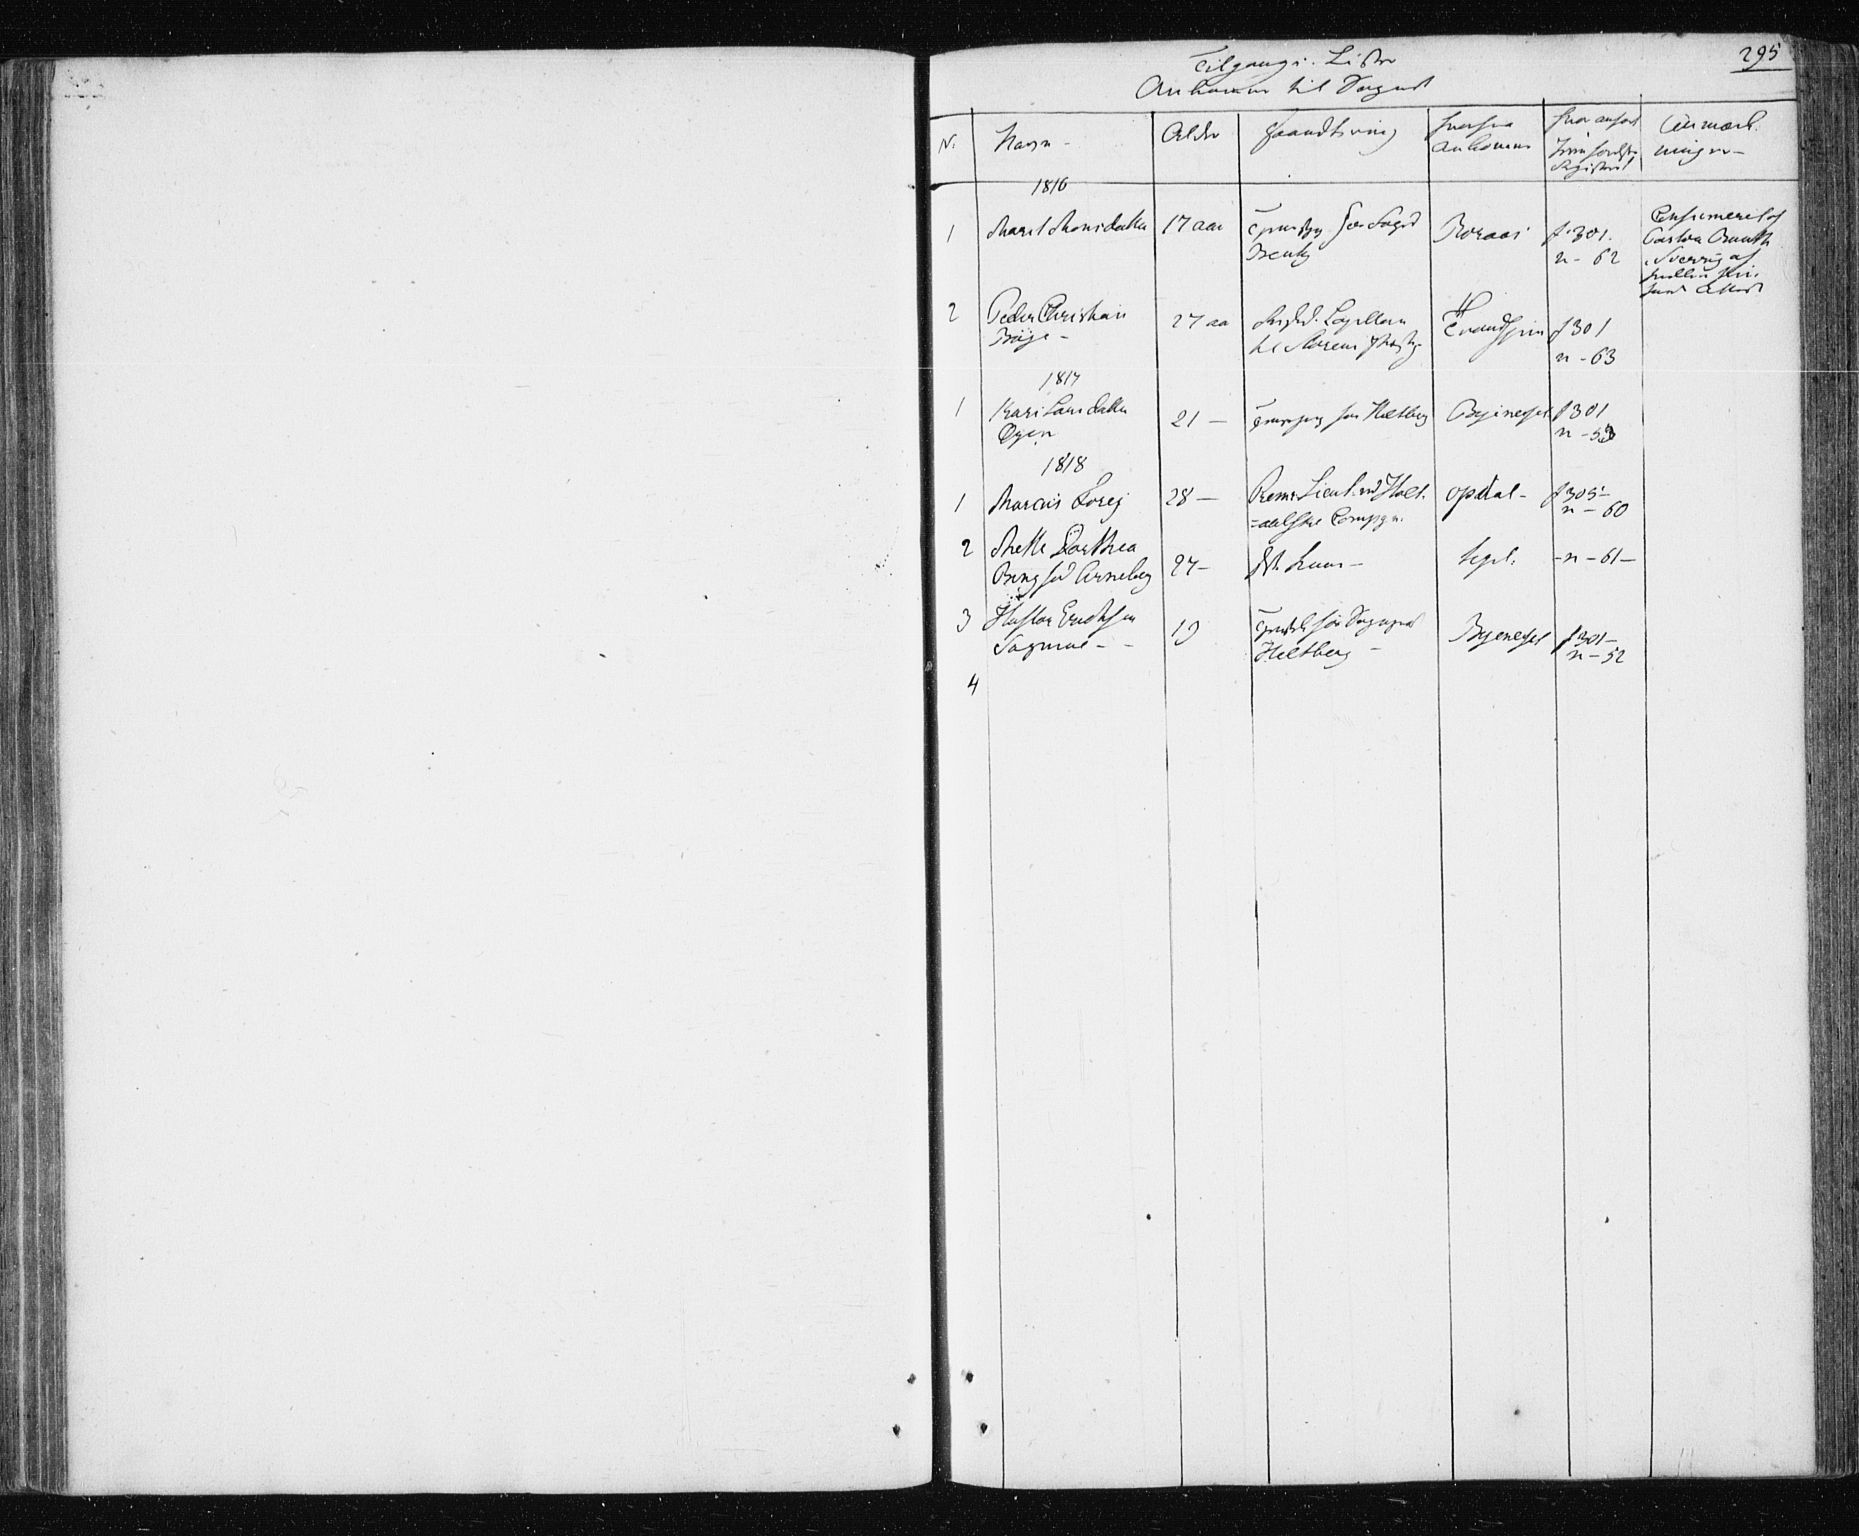 SAT, Ministerialprotokoller, klokkerbøker og fødselsregistre - Sør-Trøndelag, 687/L1017: Parish register (copy) no. 687C01, 1816-1837, p. 295